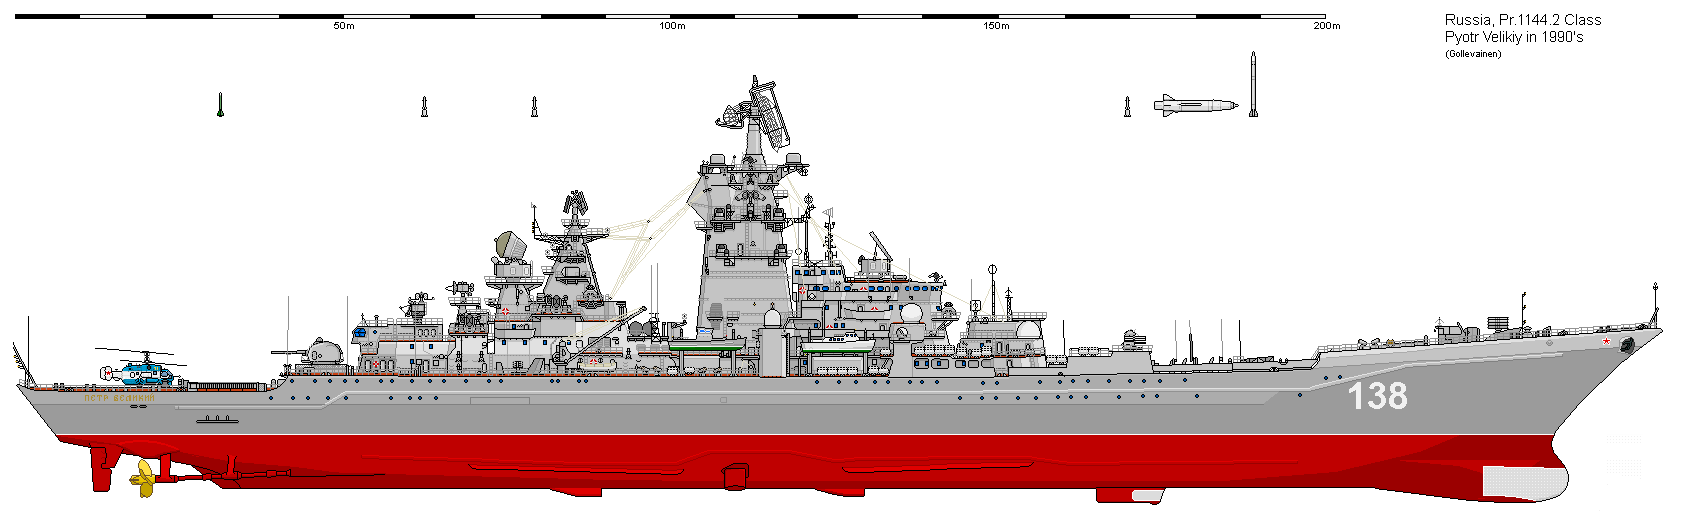 TARKR 11442 Pyotr Velikyi 1997.png